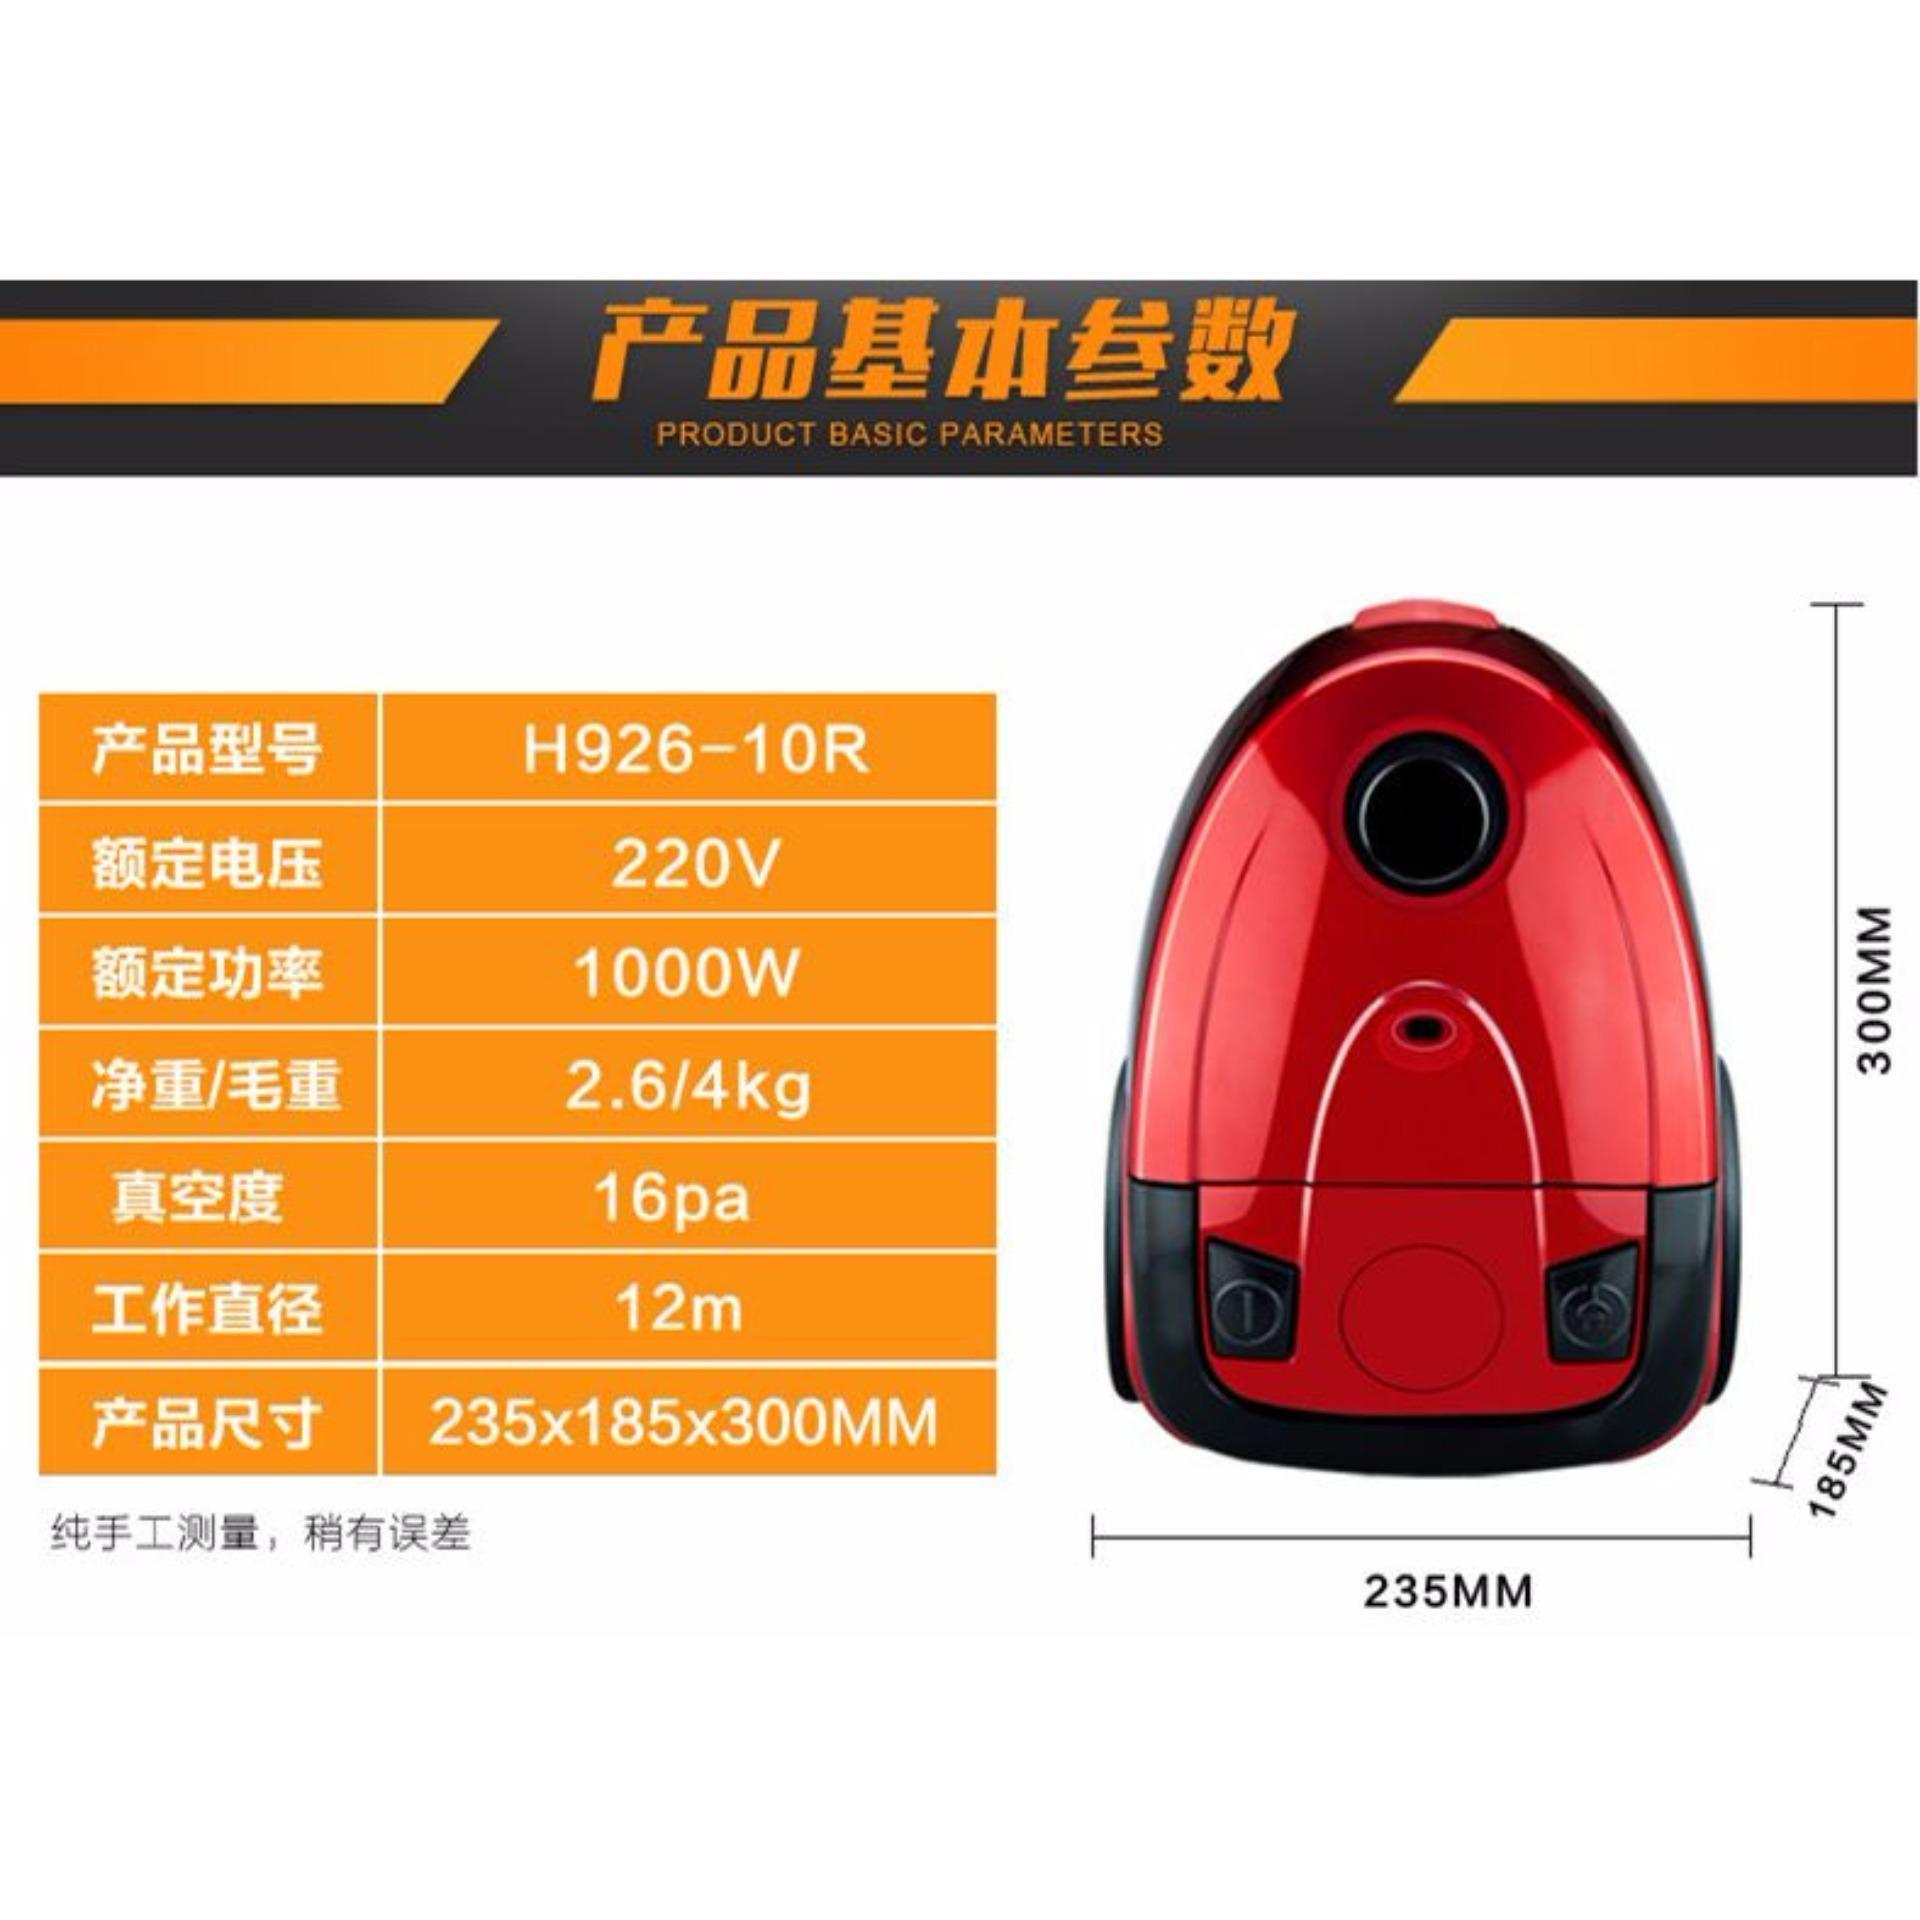 Máy hút bụi Hafuren H926-10R 1000W